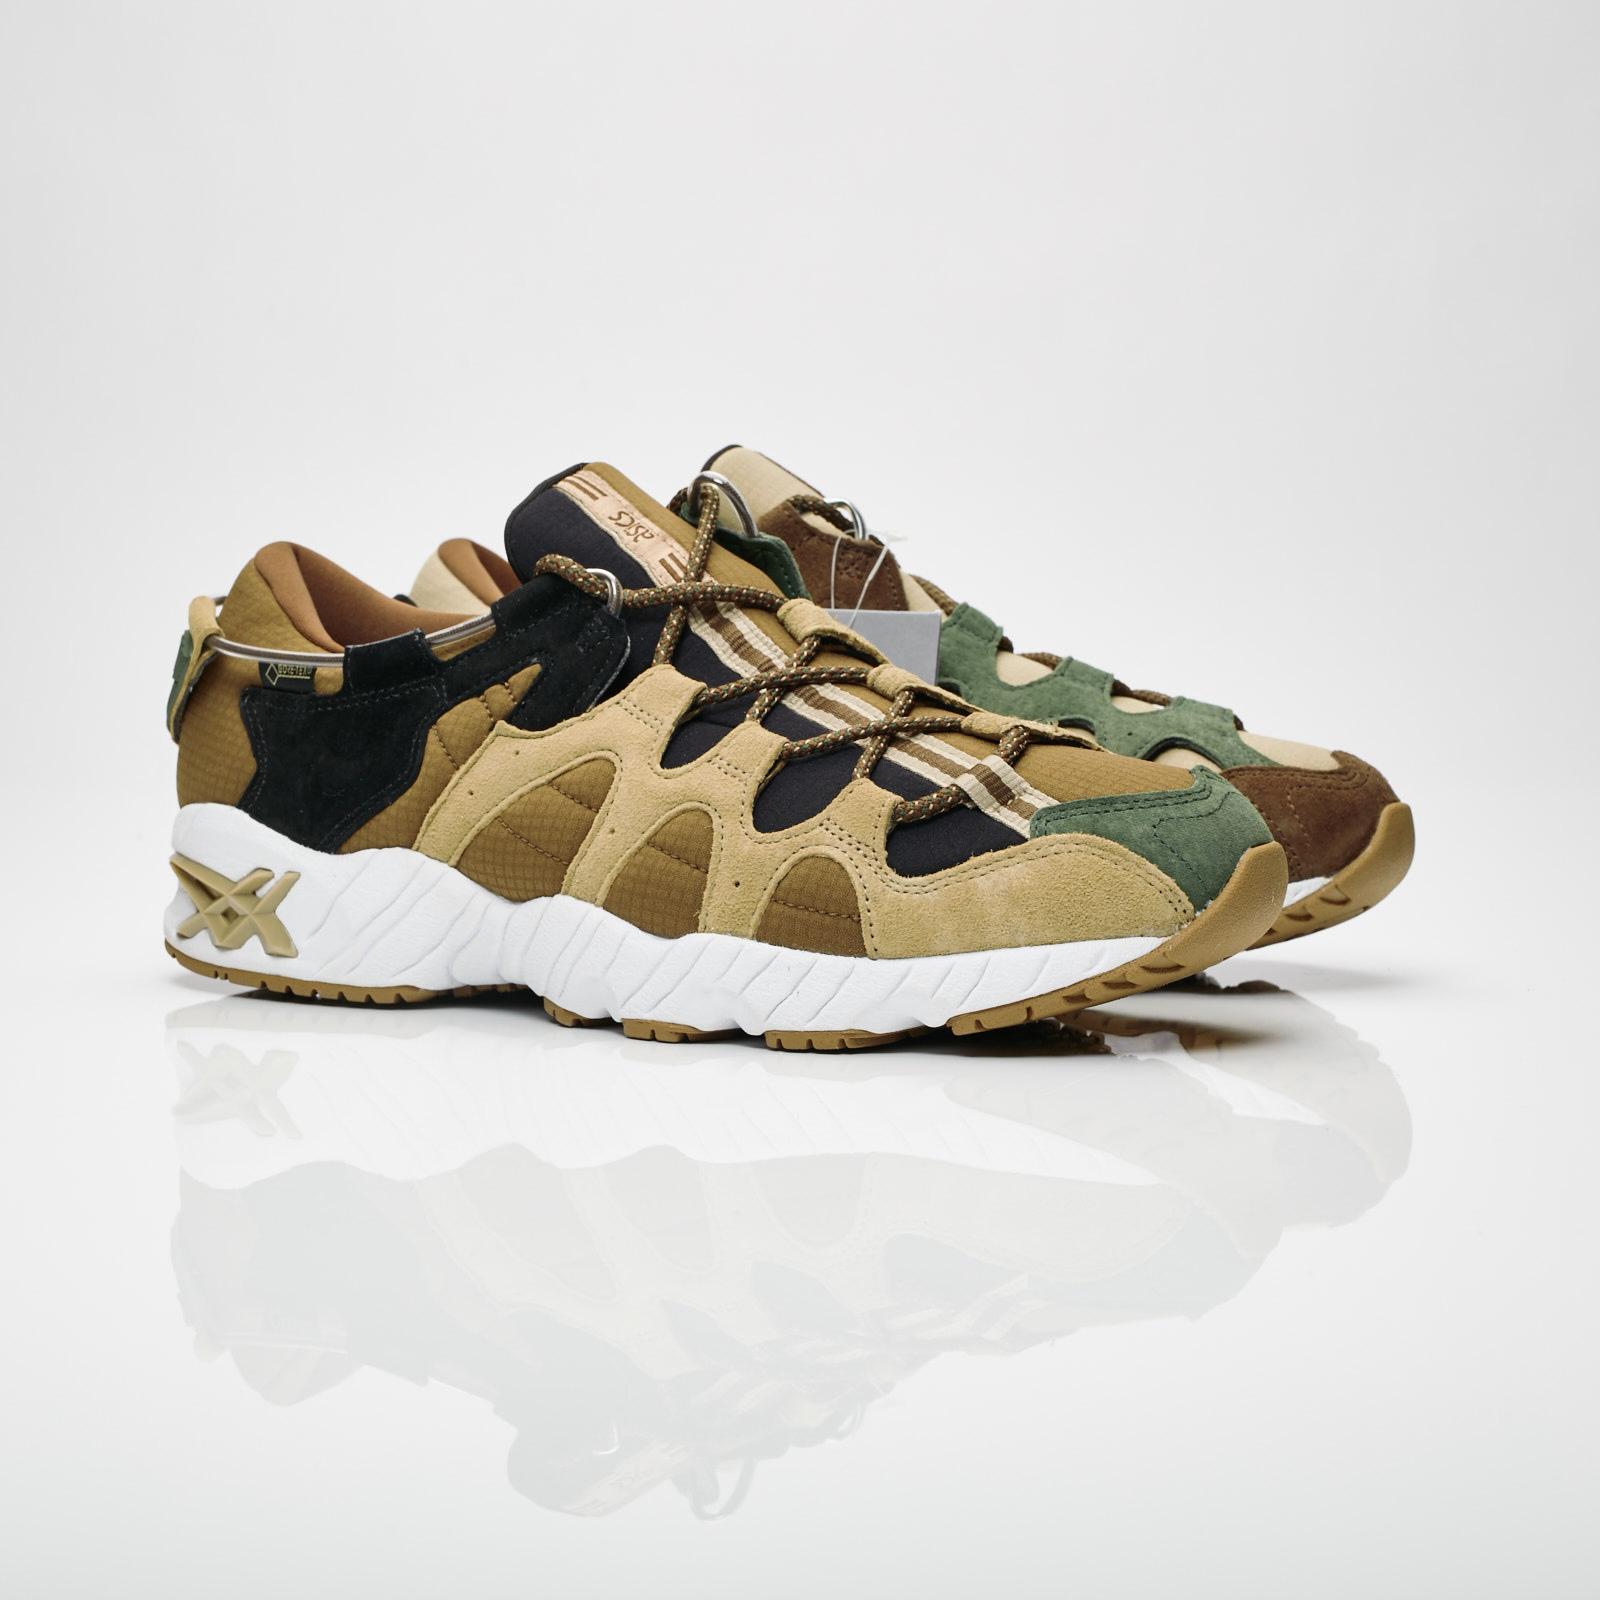 ASICS Tiger Gel-Mai GORE-TEX x Beams - H8p0q-0279 - Sneakersnstuff ... 43f81ed80